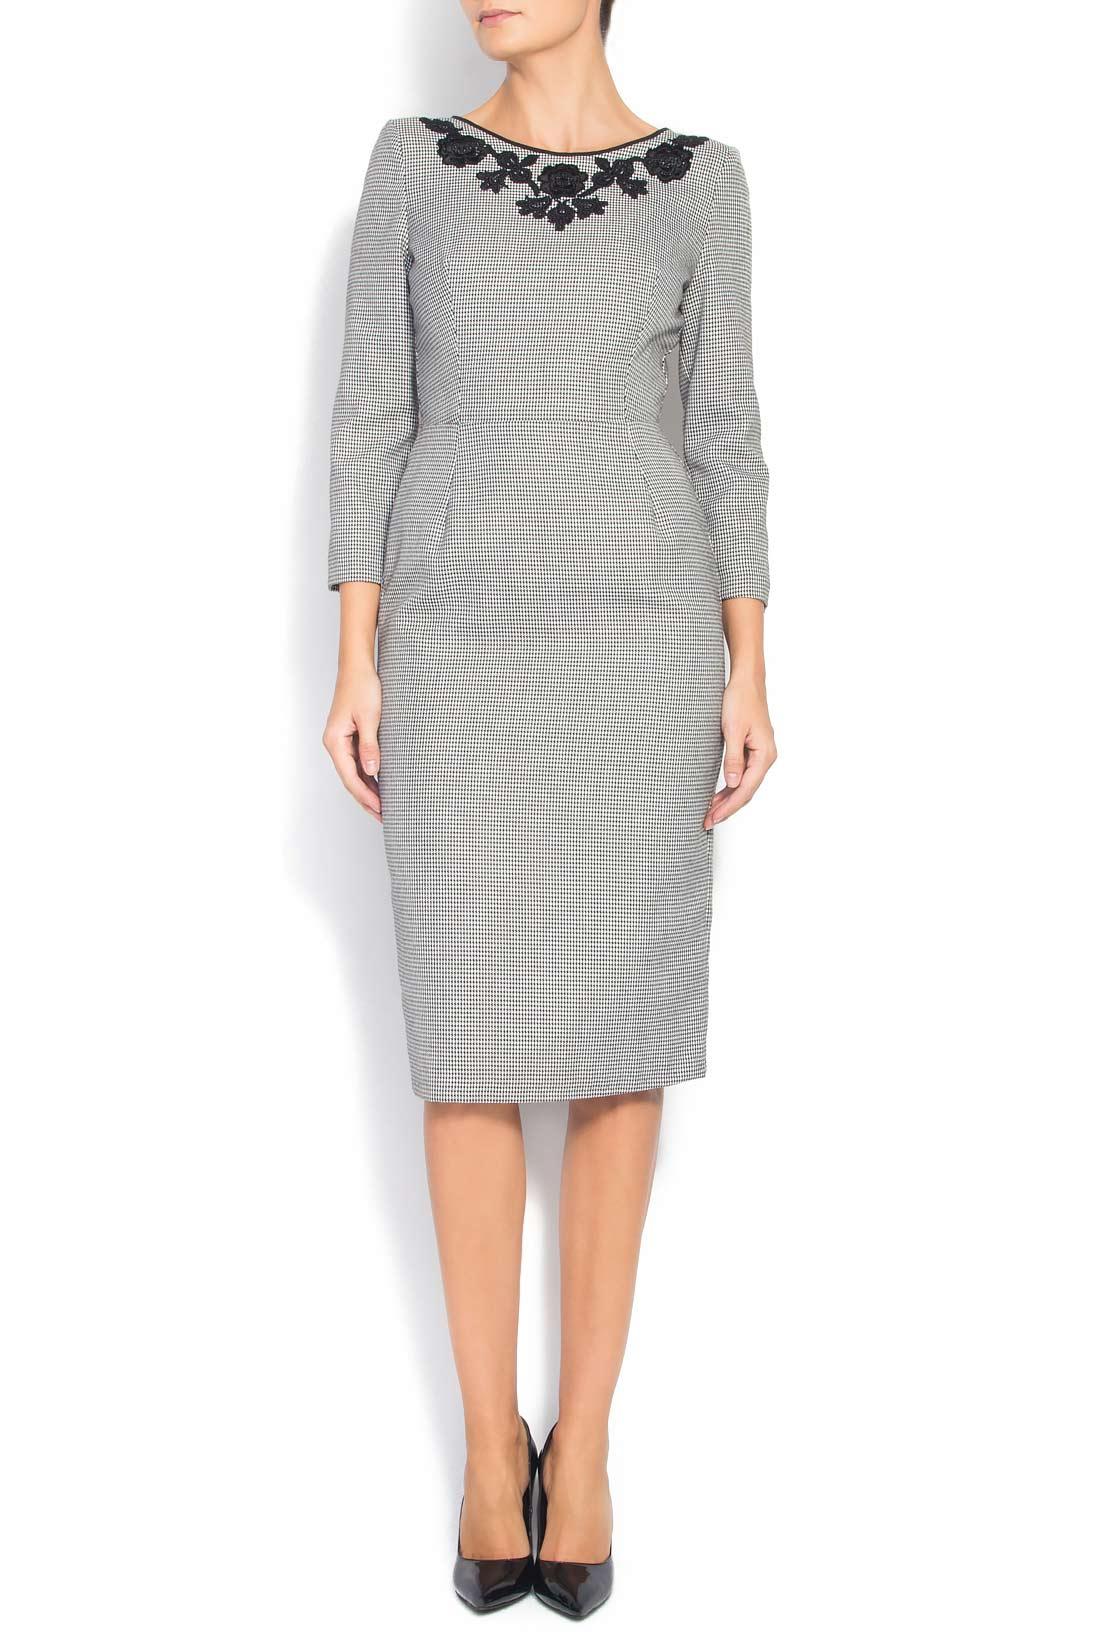 Houndstooth dress Cristina Staicu image 0